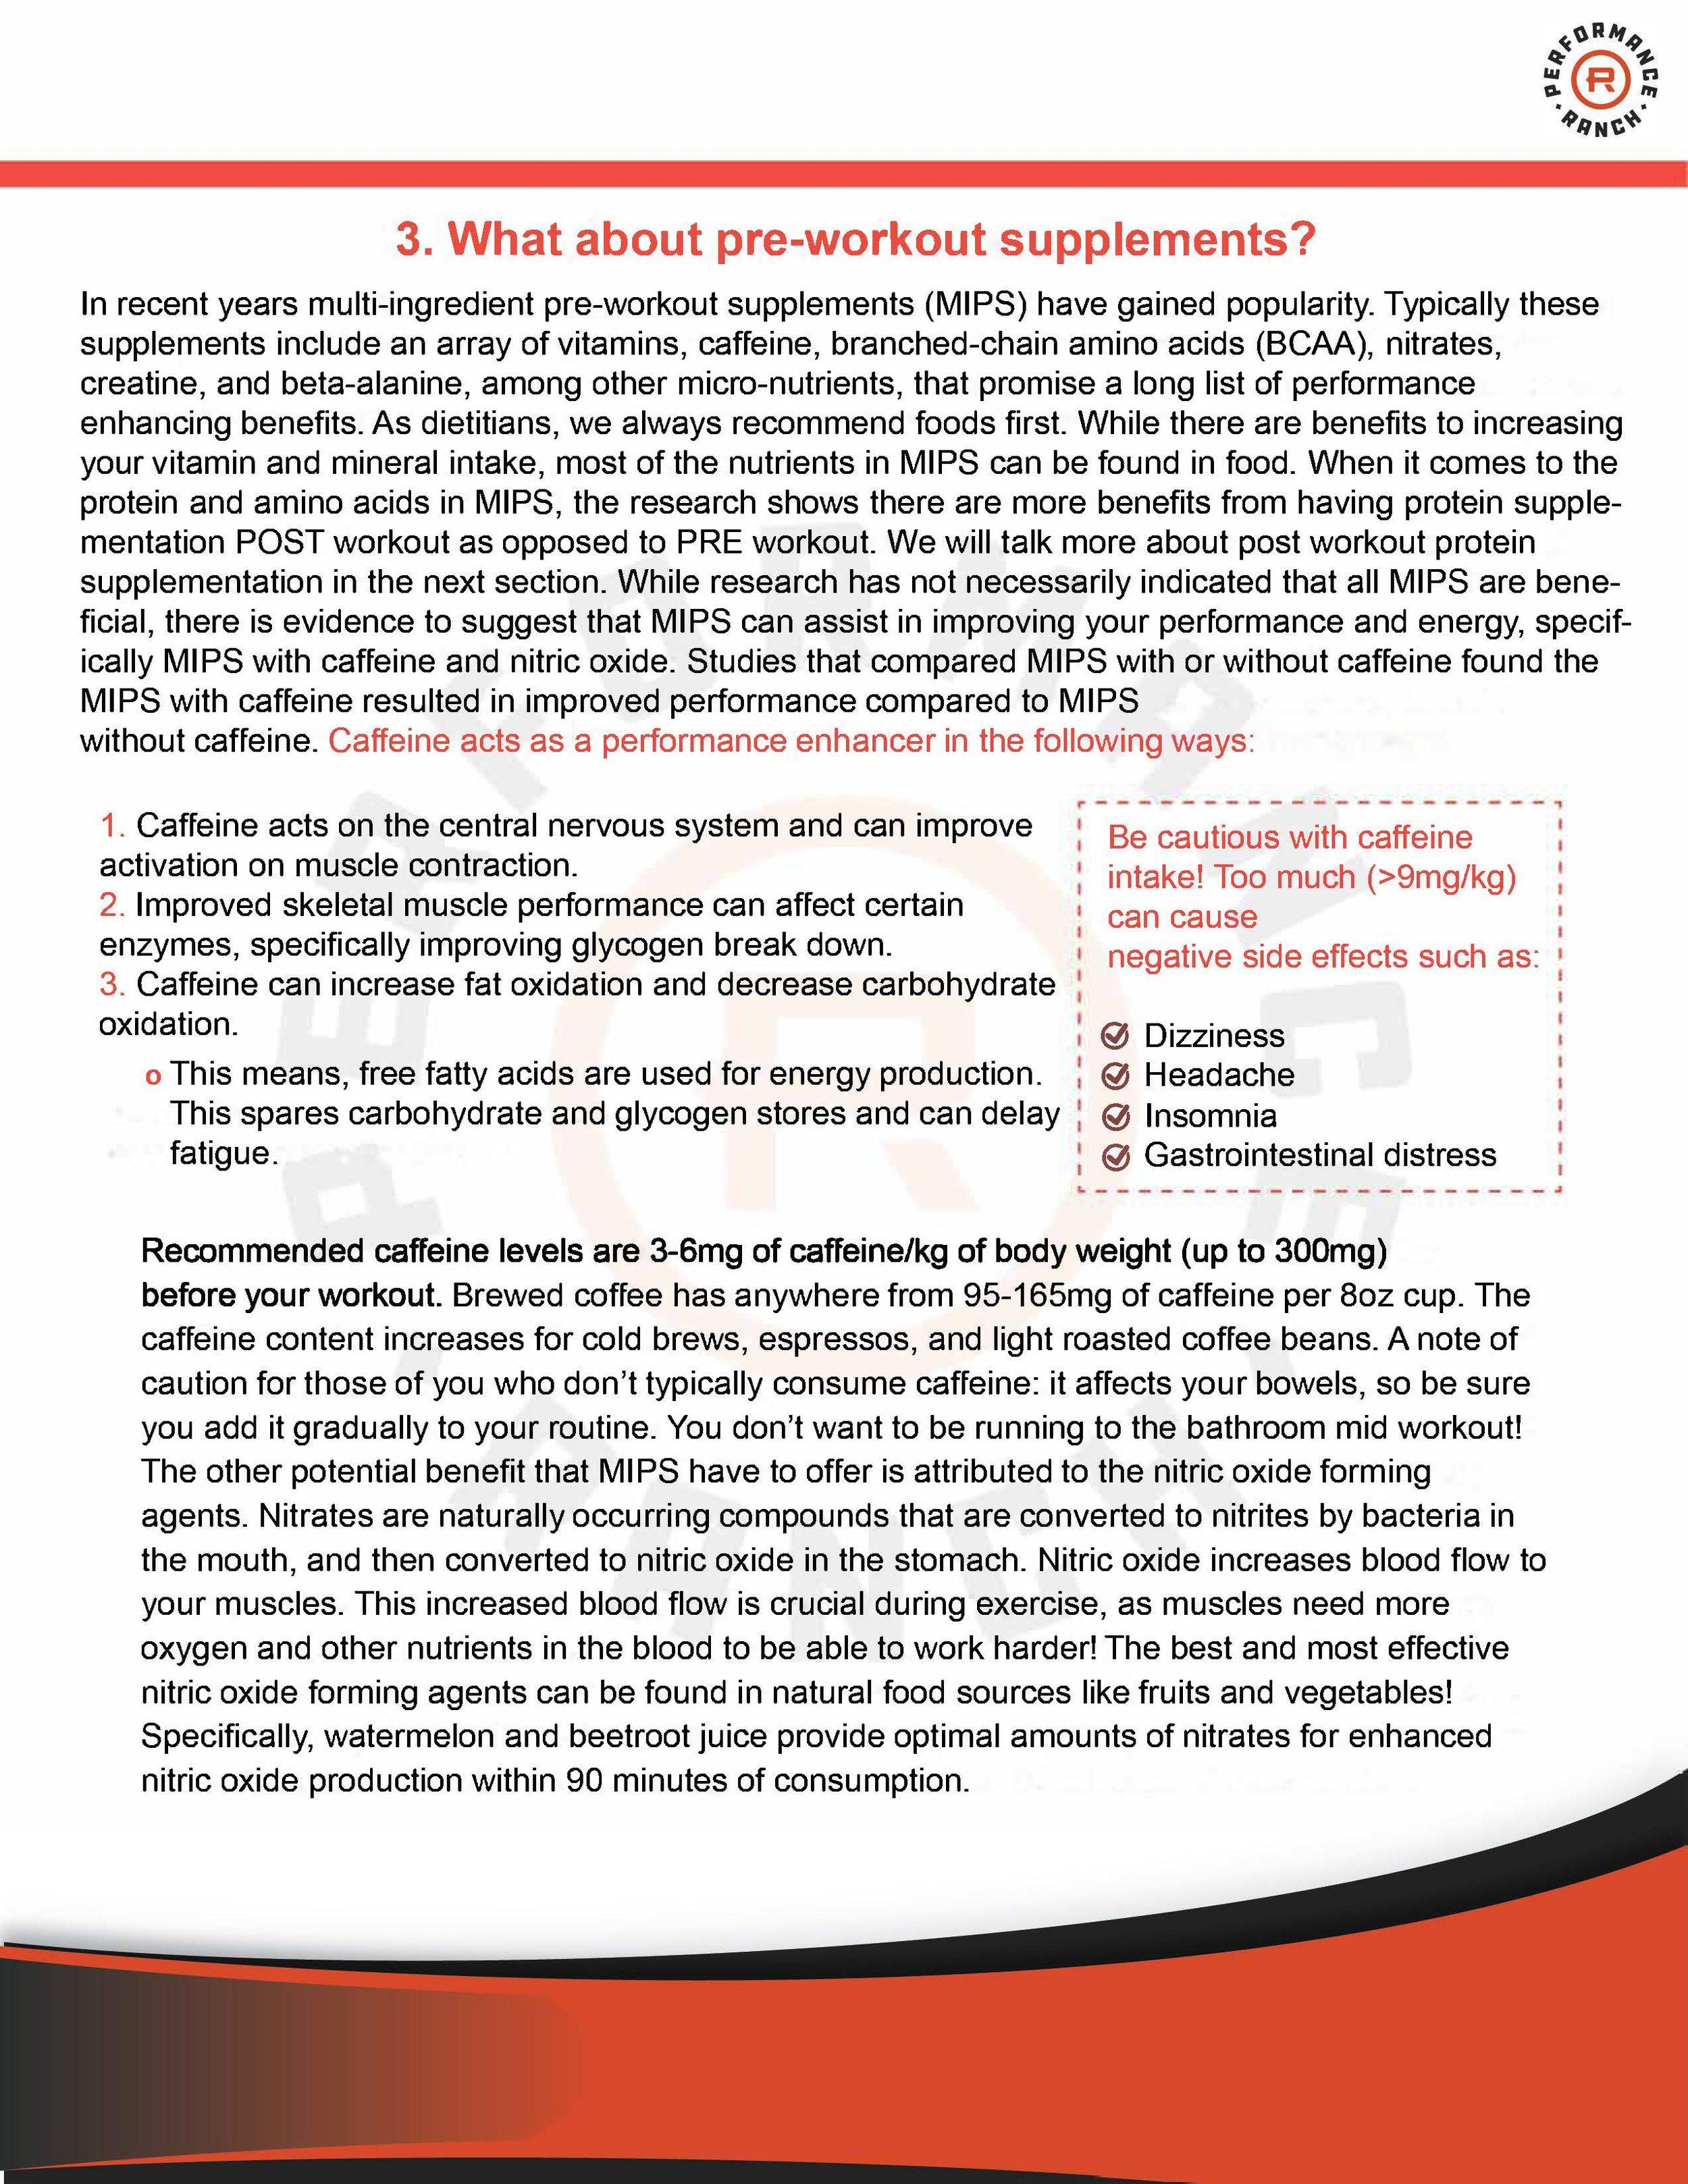 Fuel Plan Education_Page_4.jpg